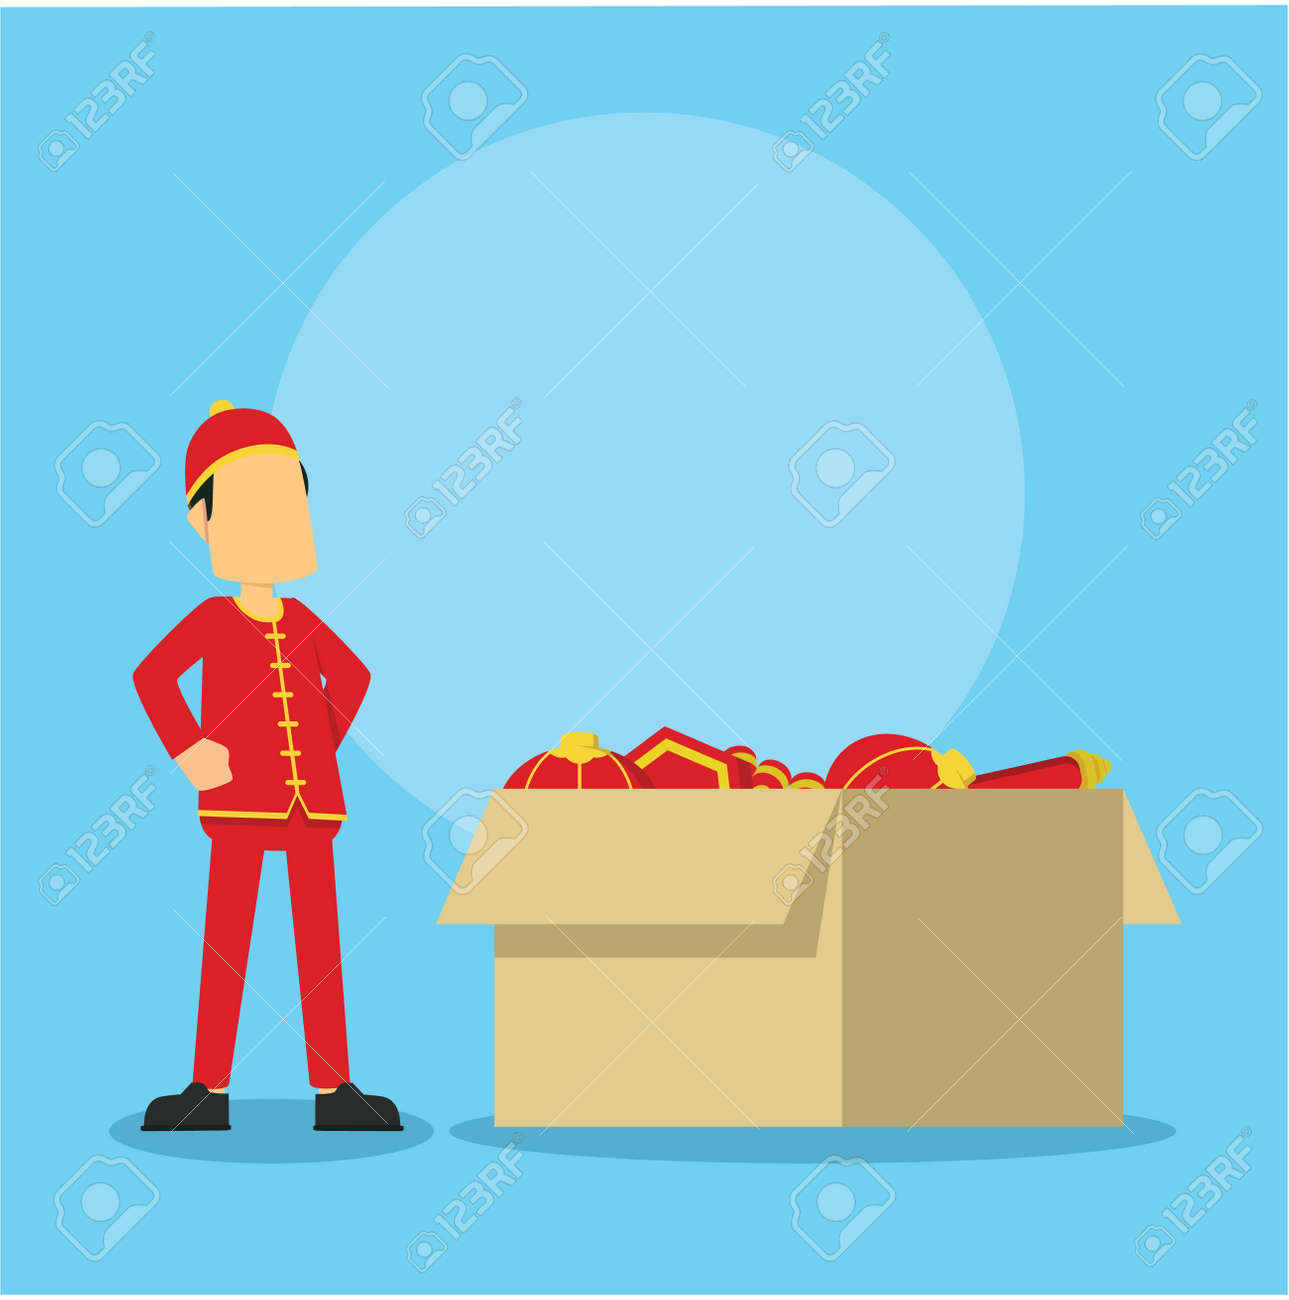 chinese man and big box full of chinese stuff - 70647130